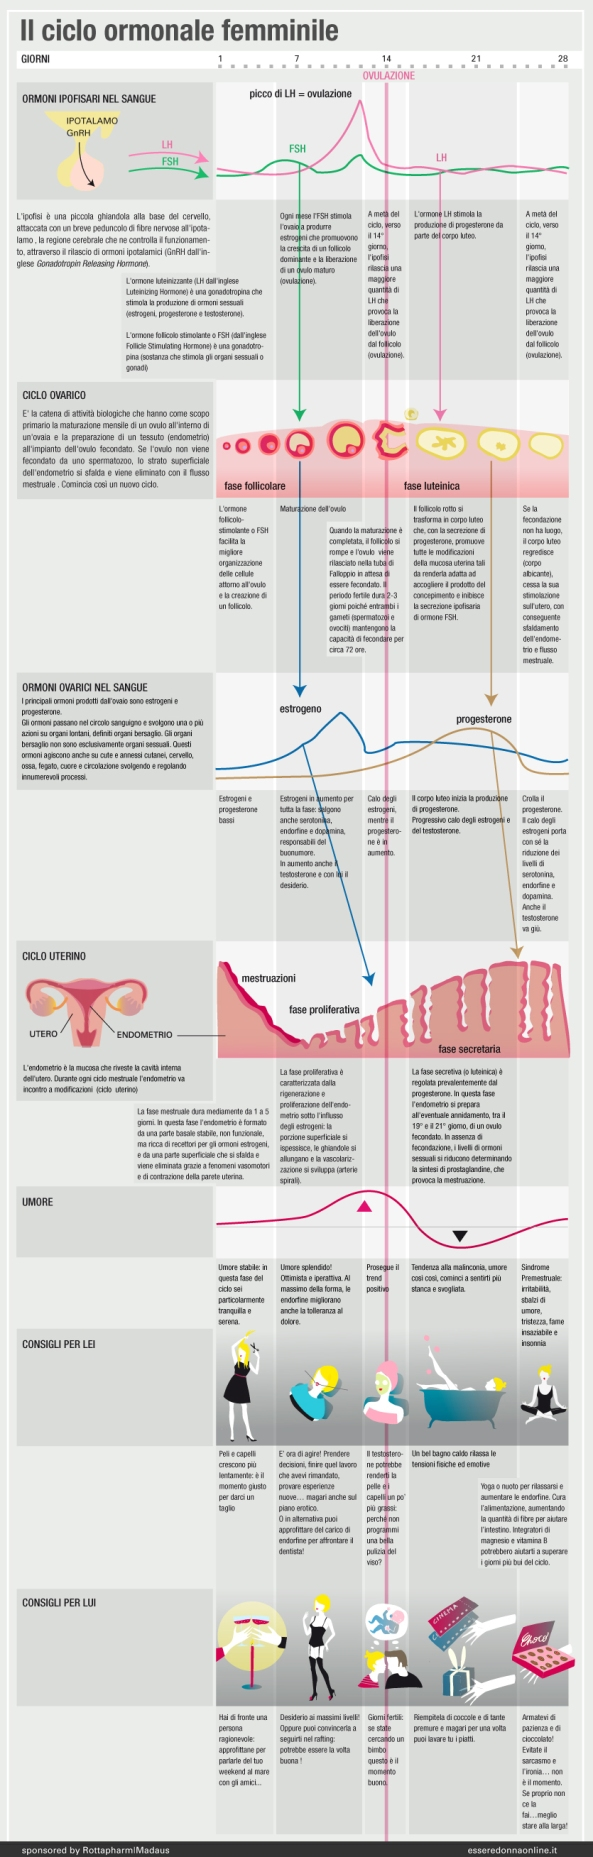 infografica sul ciclo mestruale